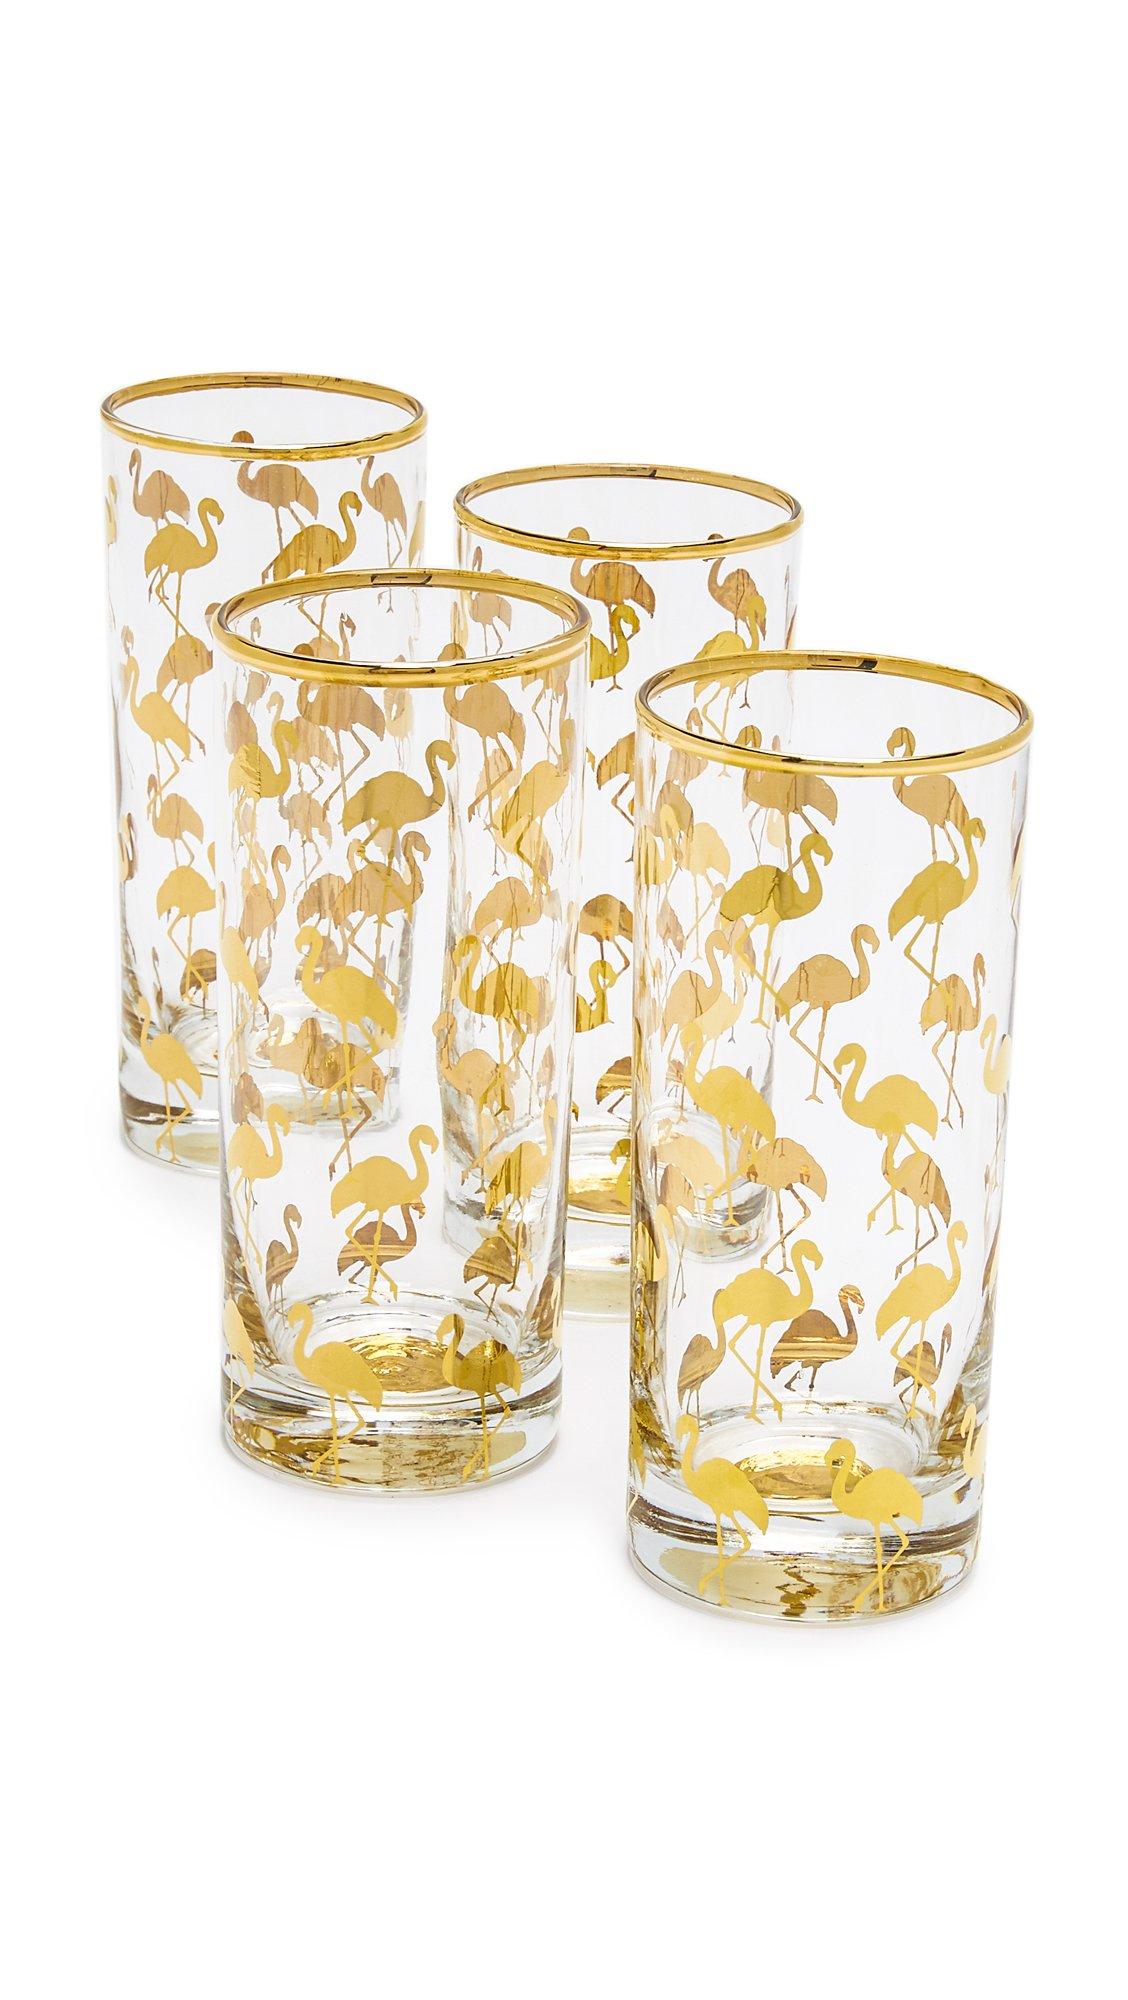 Rosanna 96579 Patio Party Set of 4 Flamingo Highball Glasses, 12 oz, Multicolor